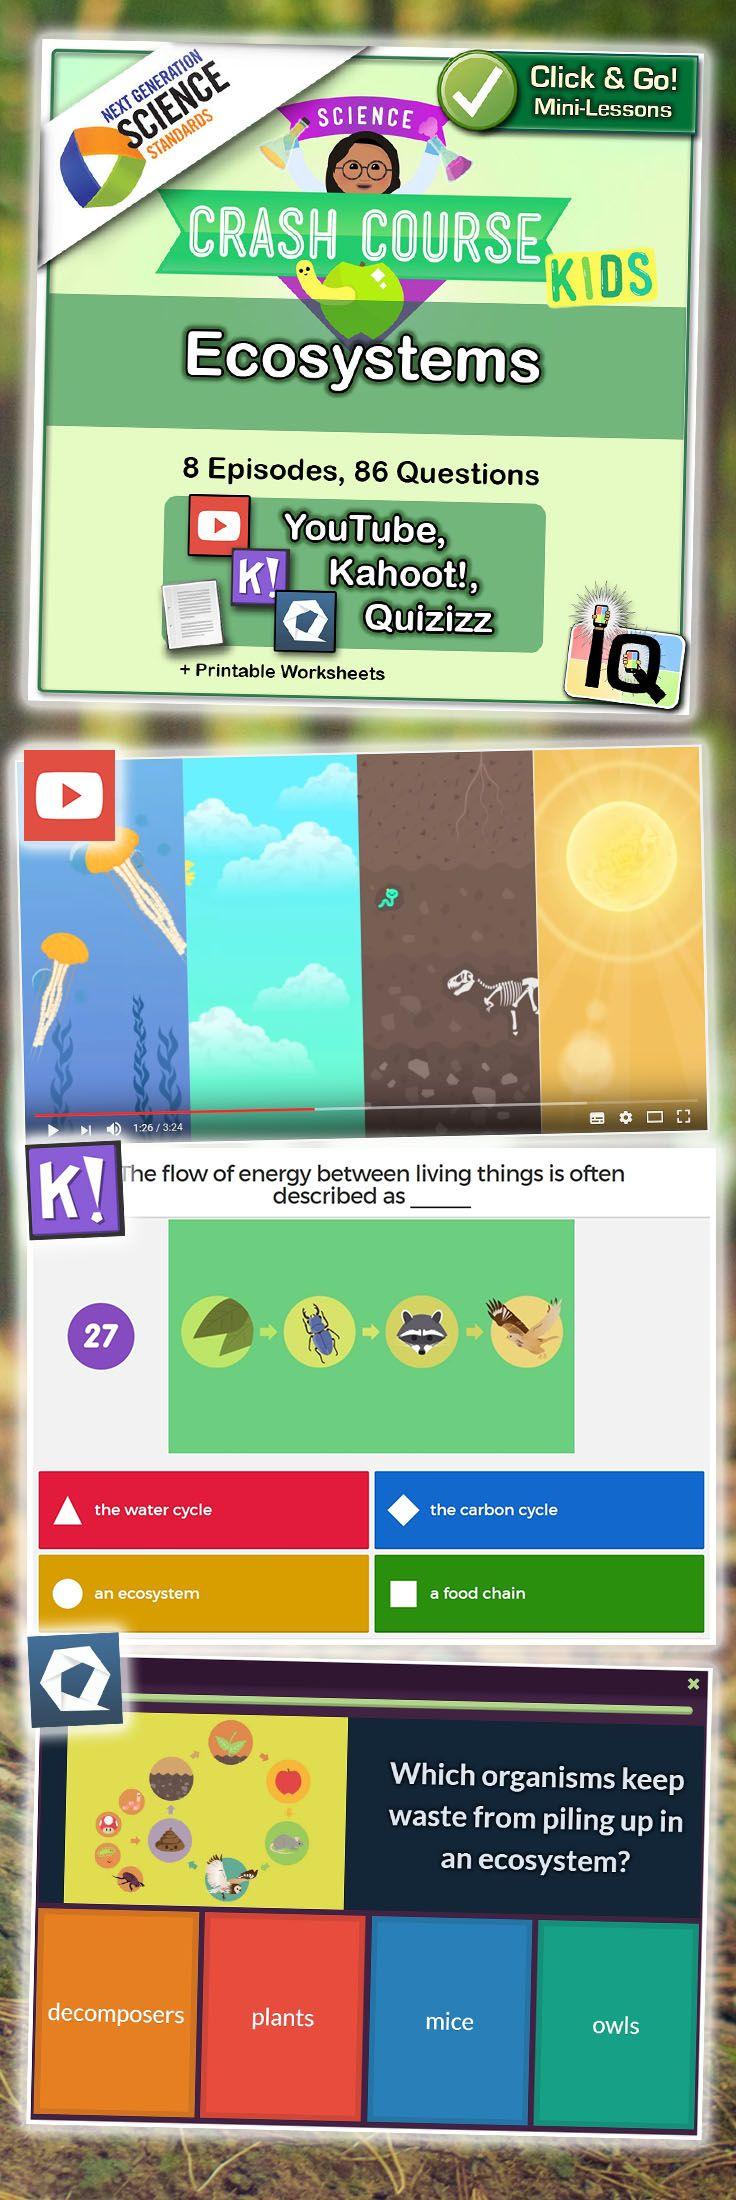 Crash Course Kids, Ecosystems Environmental education